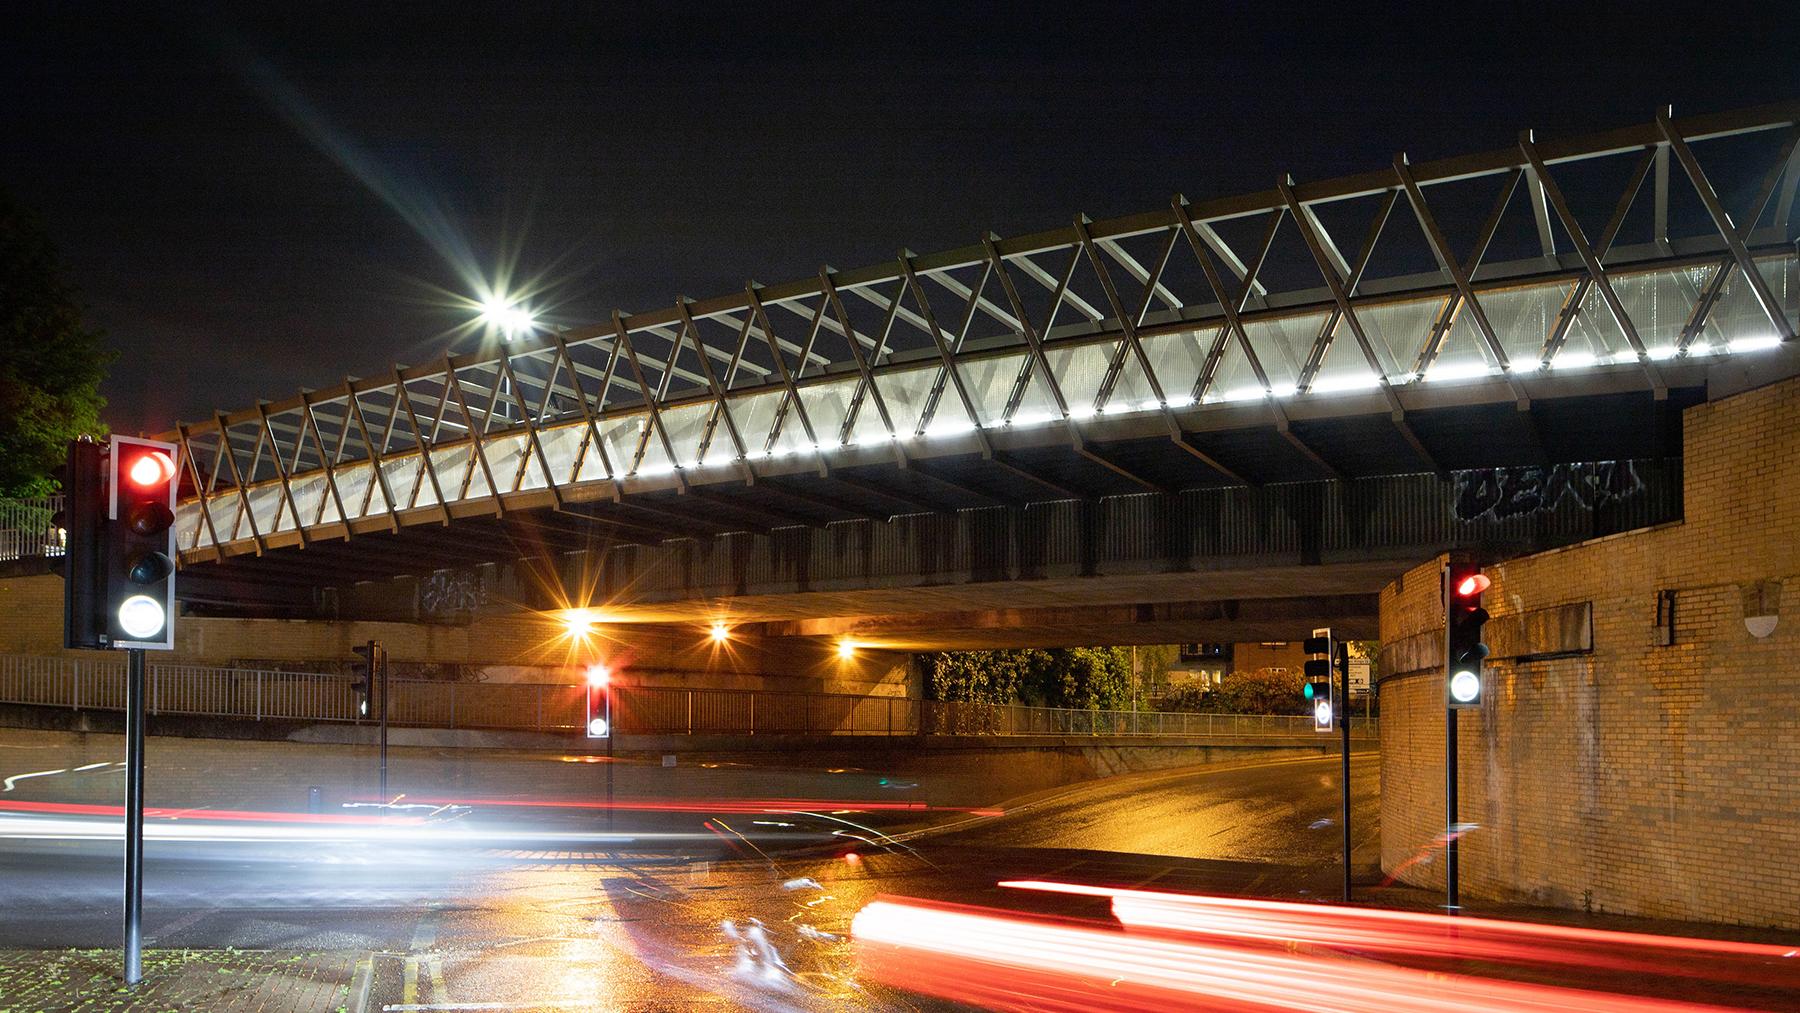 Sarah-Wigglesworth-Architects Kingston-Go-Cycle Bridge Wide Shot Night  1800x1013